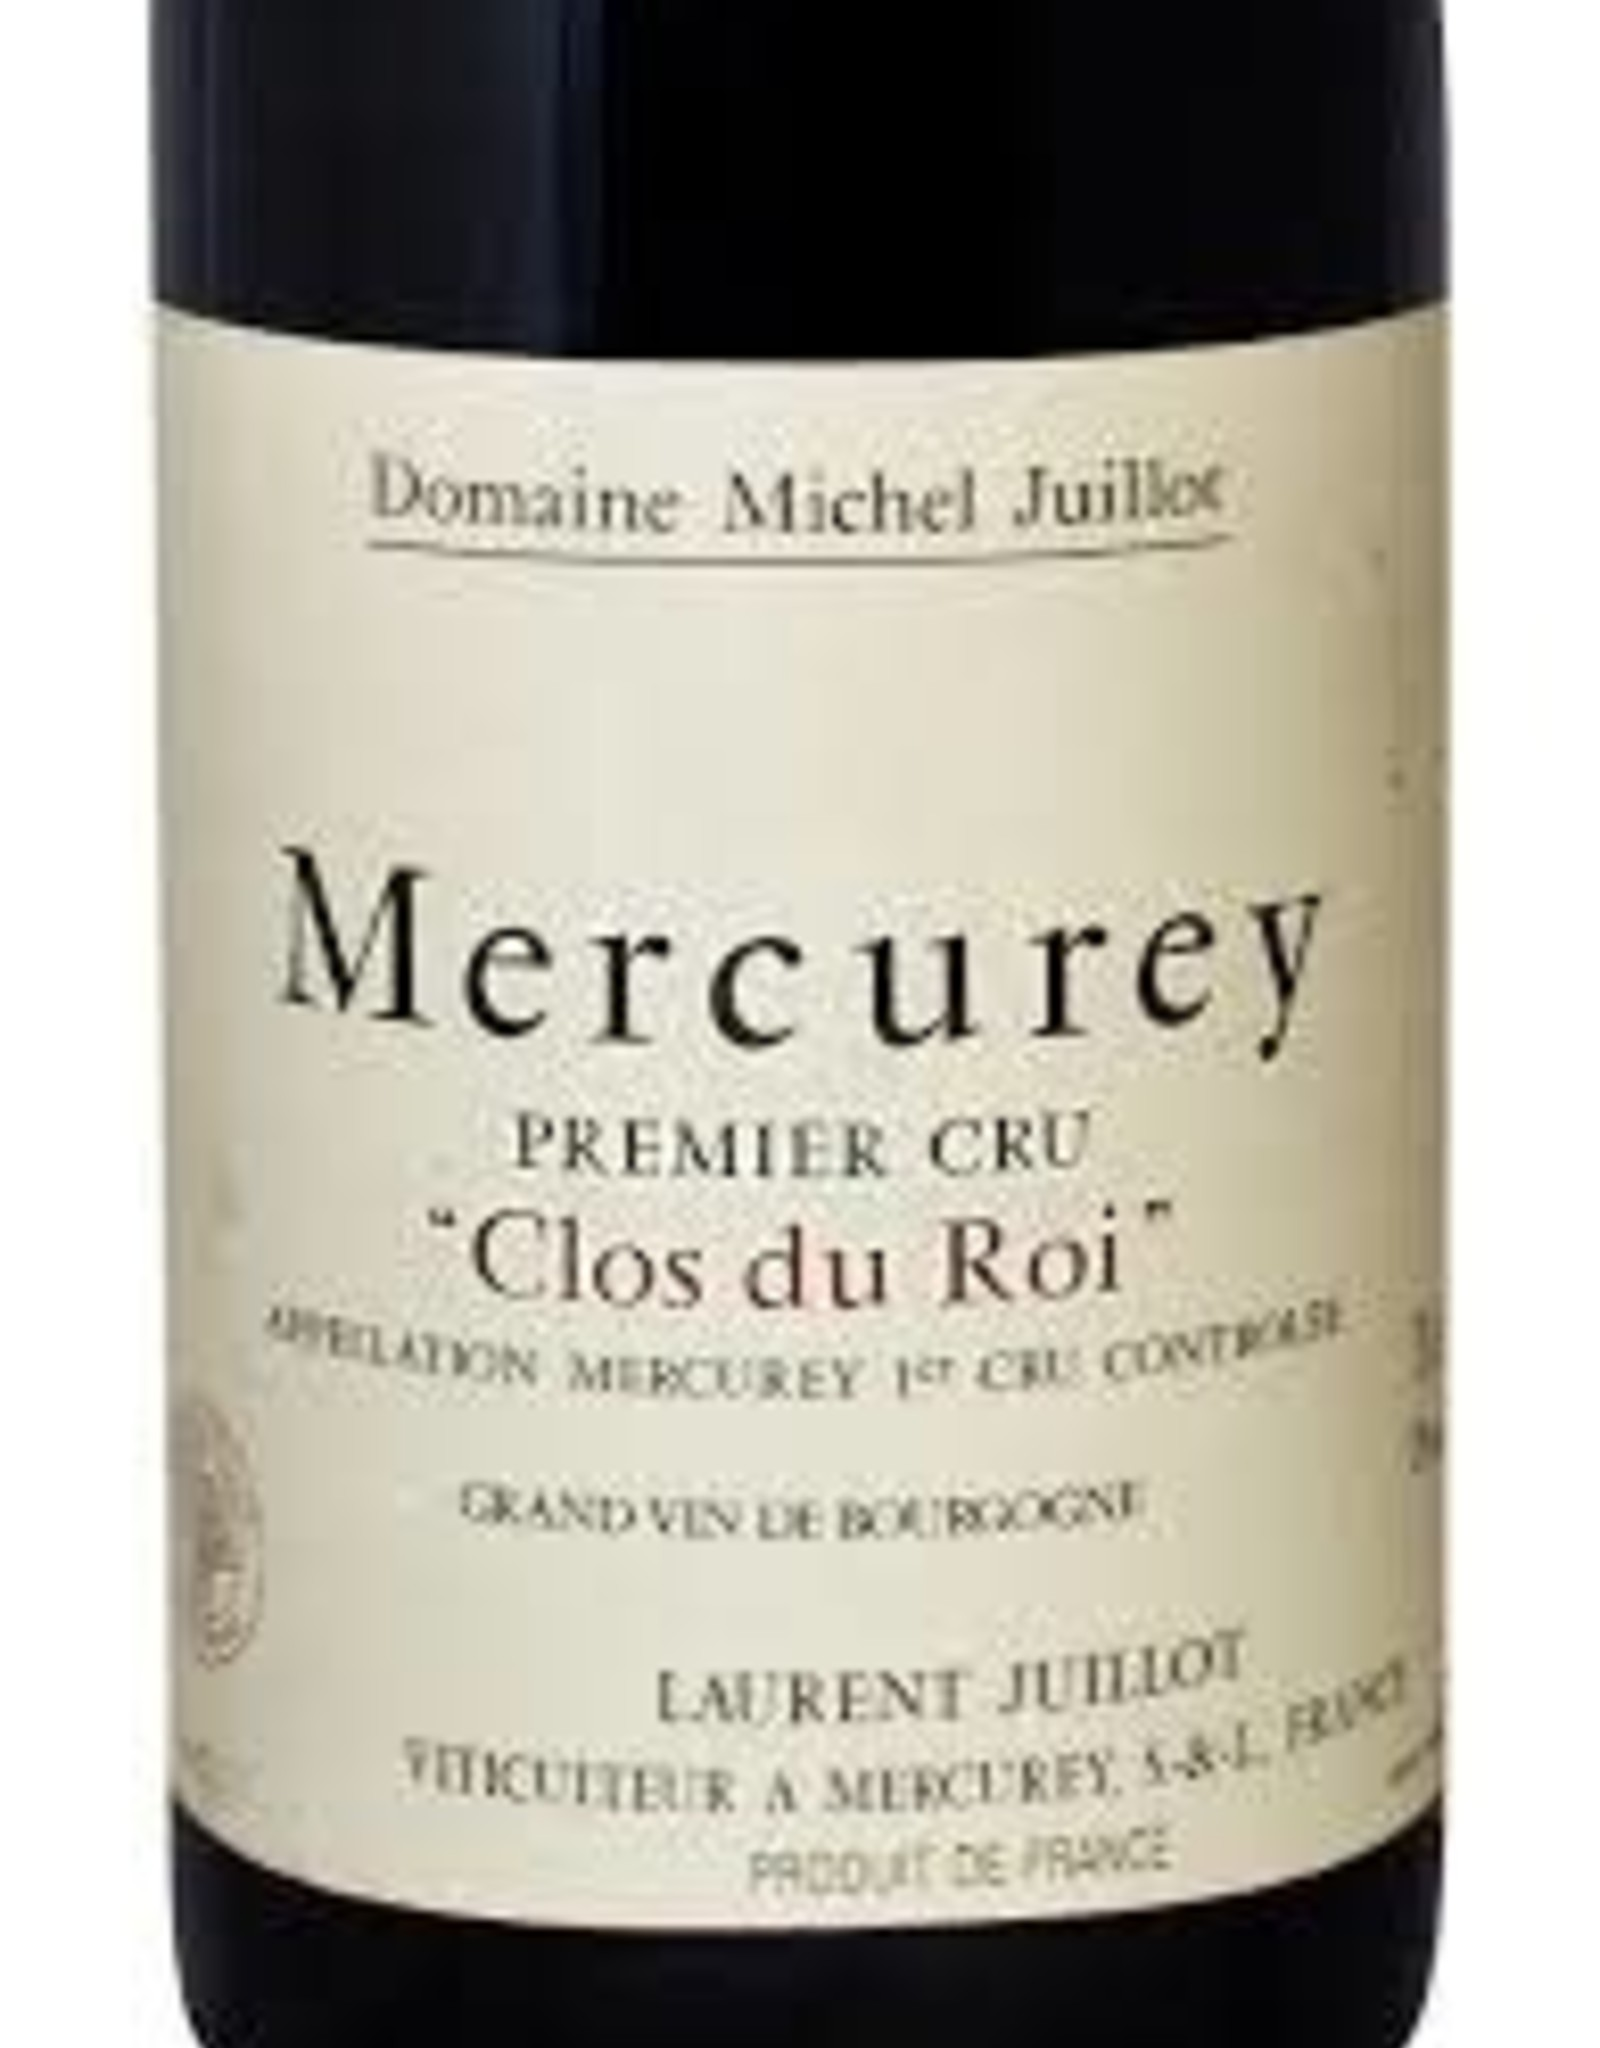 R Burgundy, Mercurey, CLOS DU ROI, Michel Juillot 2016 (1.5 L)